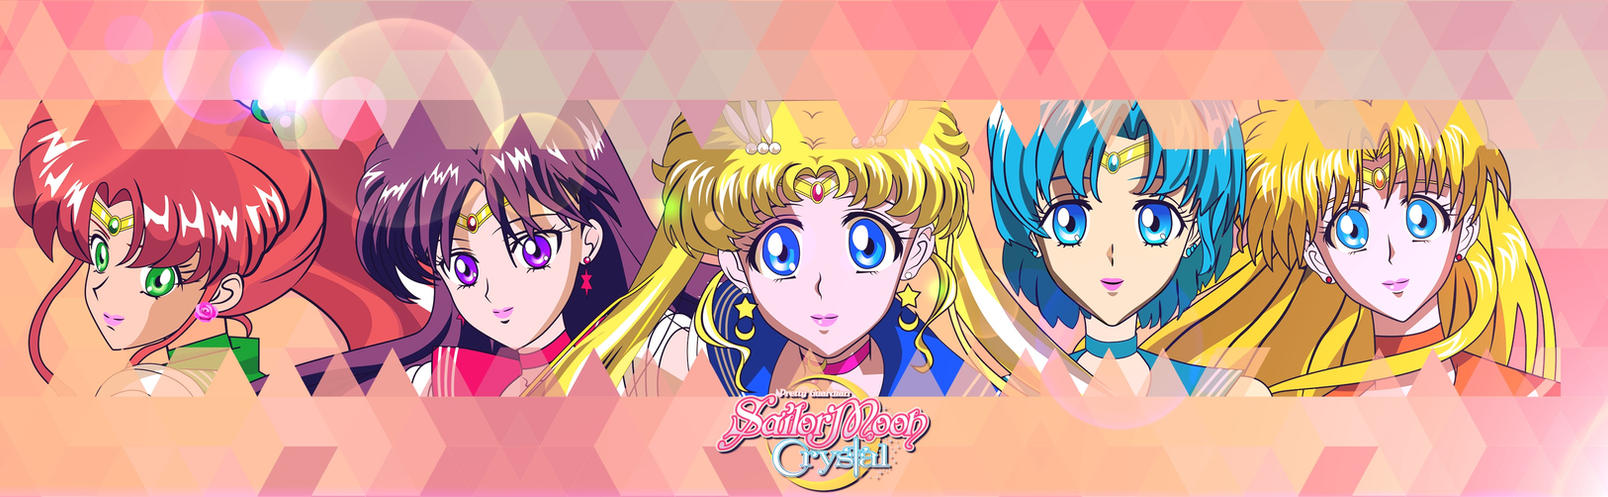 Sailor Moon Crystal Banner by sammy8a